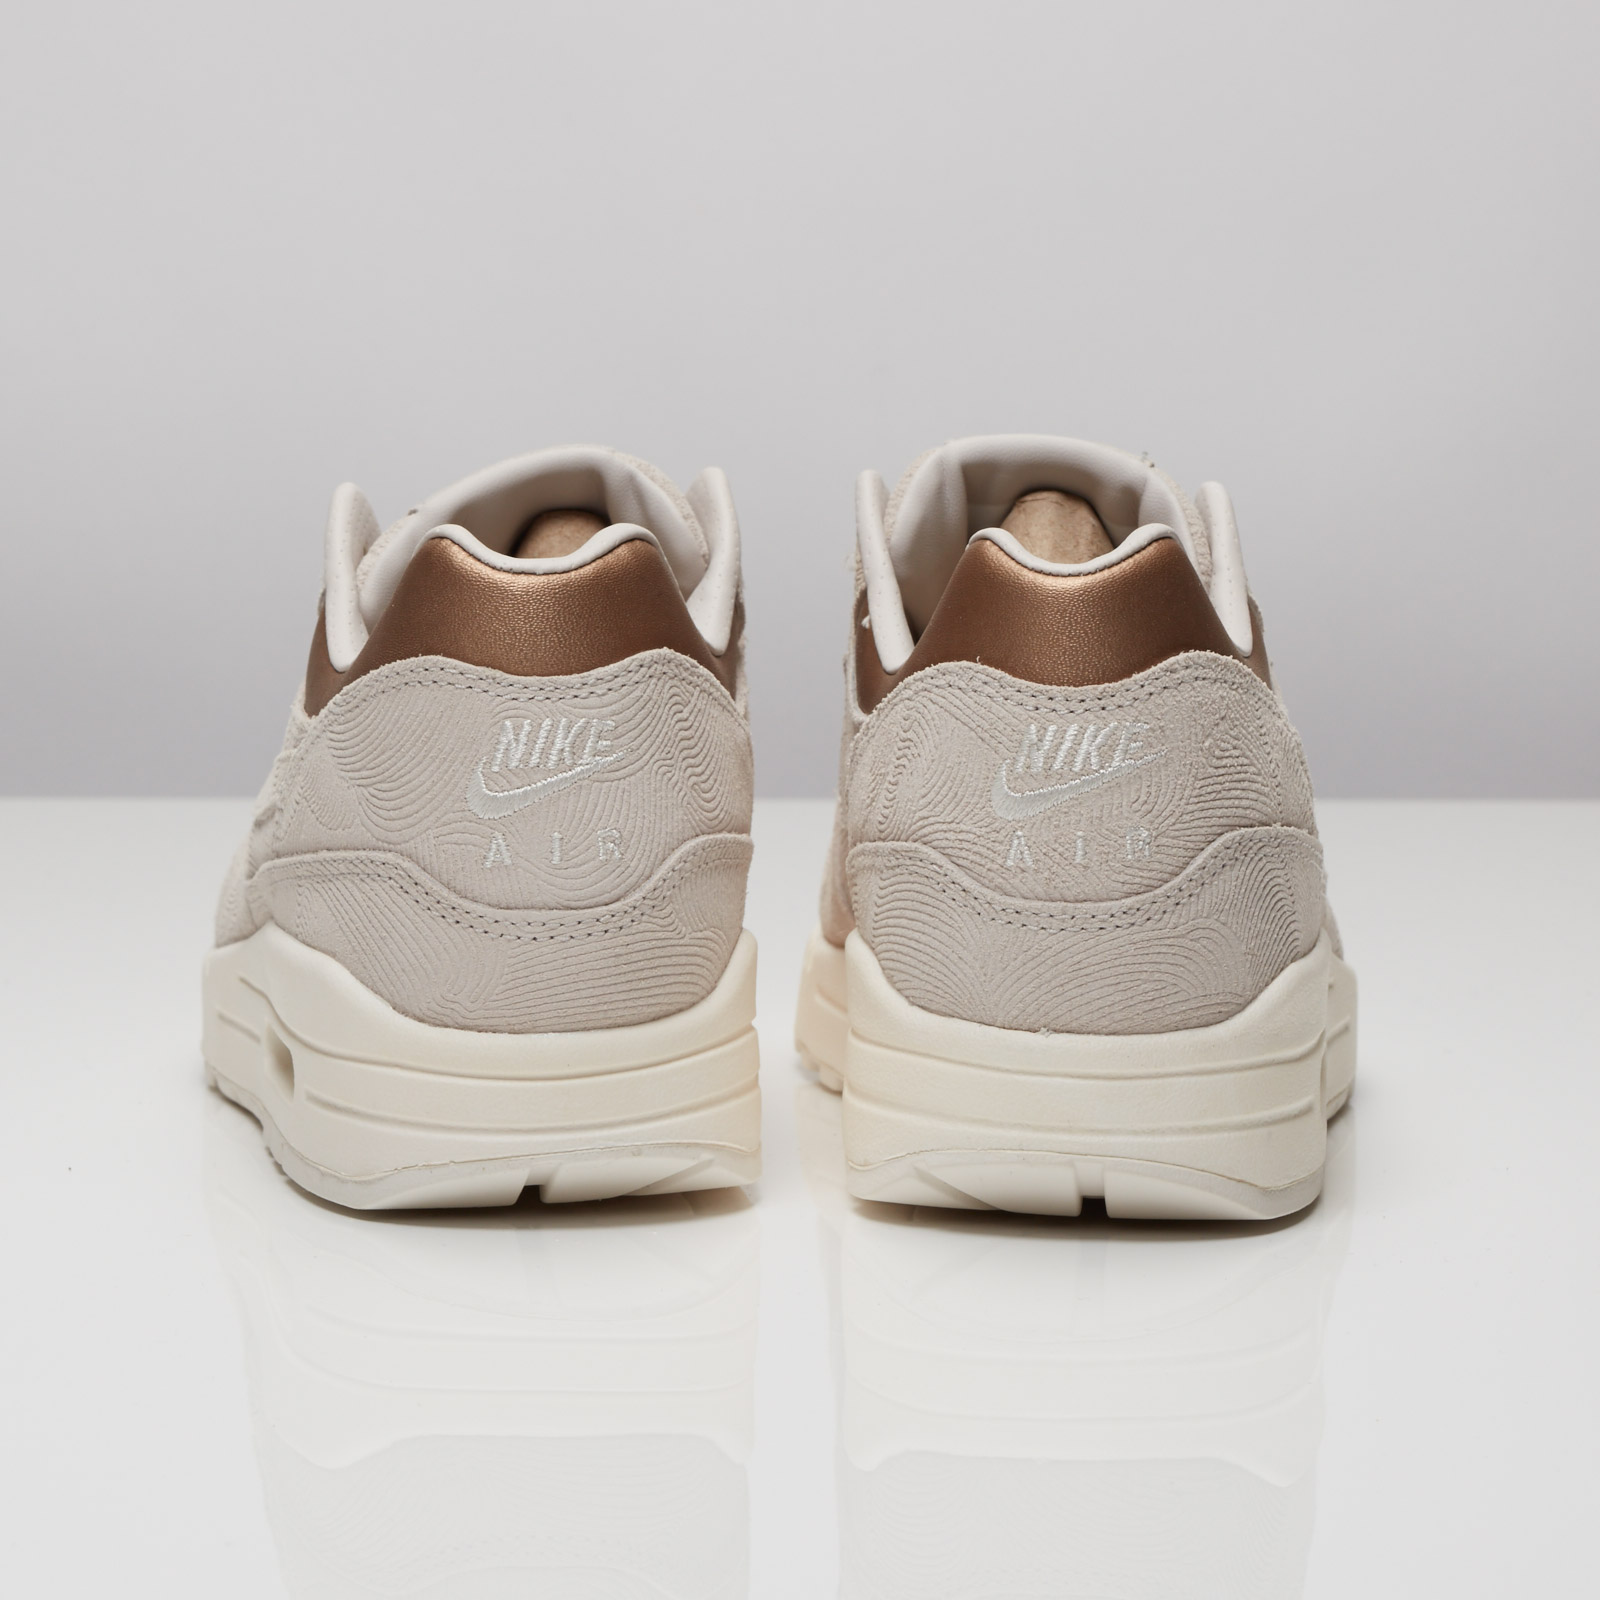 Nike WMNS Air Max 1 Premium gamma grey metallic golden (454746 009)